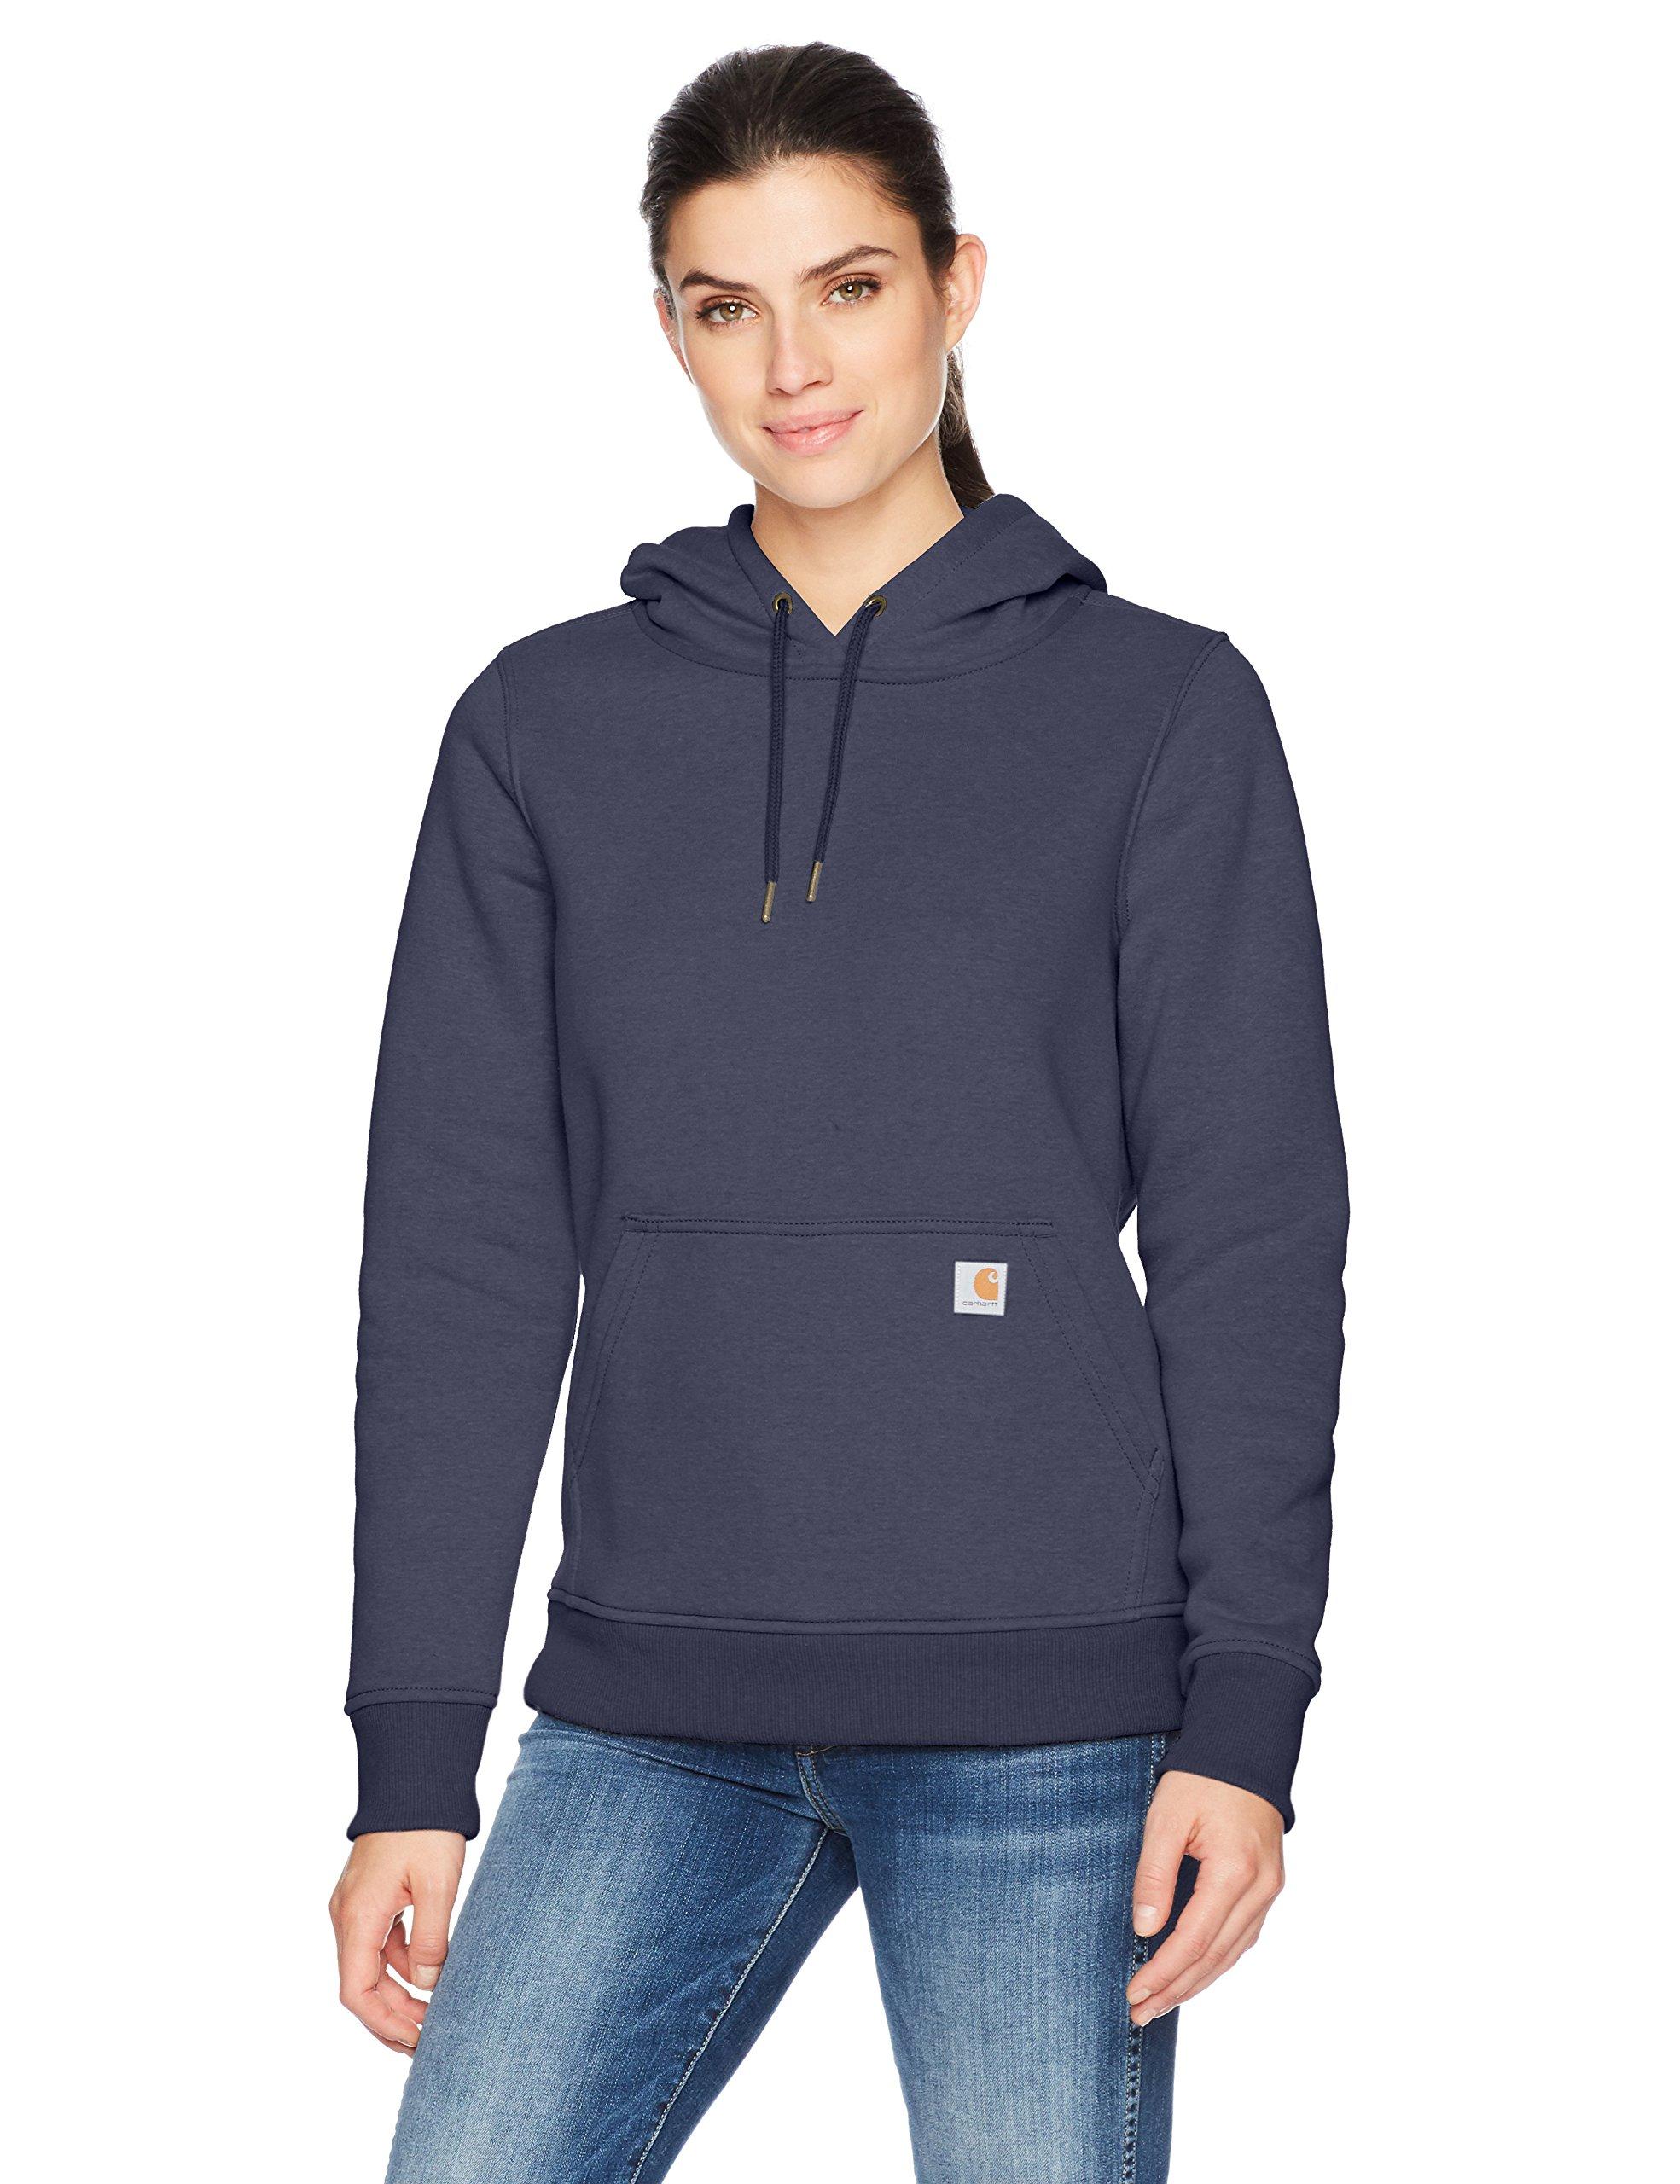 Carhartt Women's Clarksburg Pullover Sweatshirt, Navy, XXL